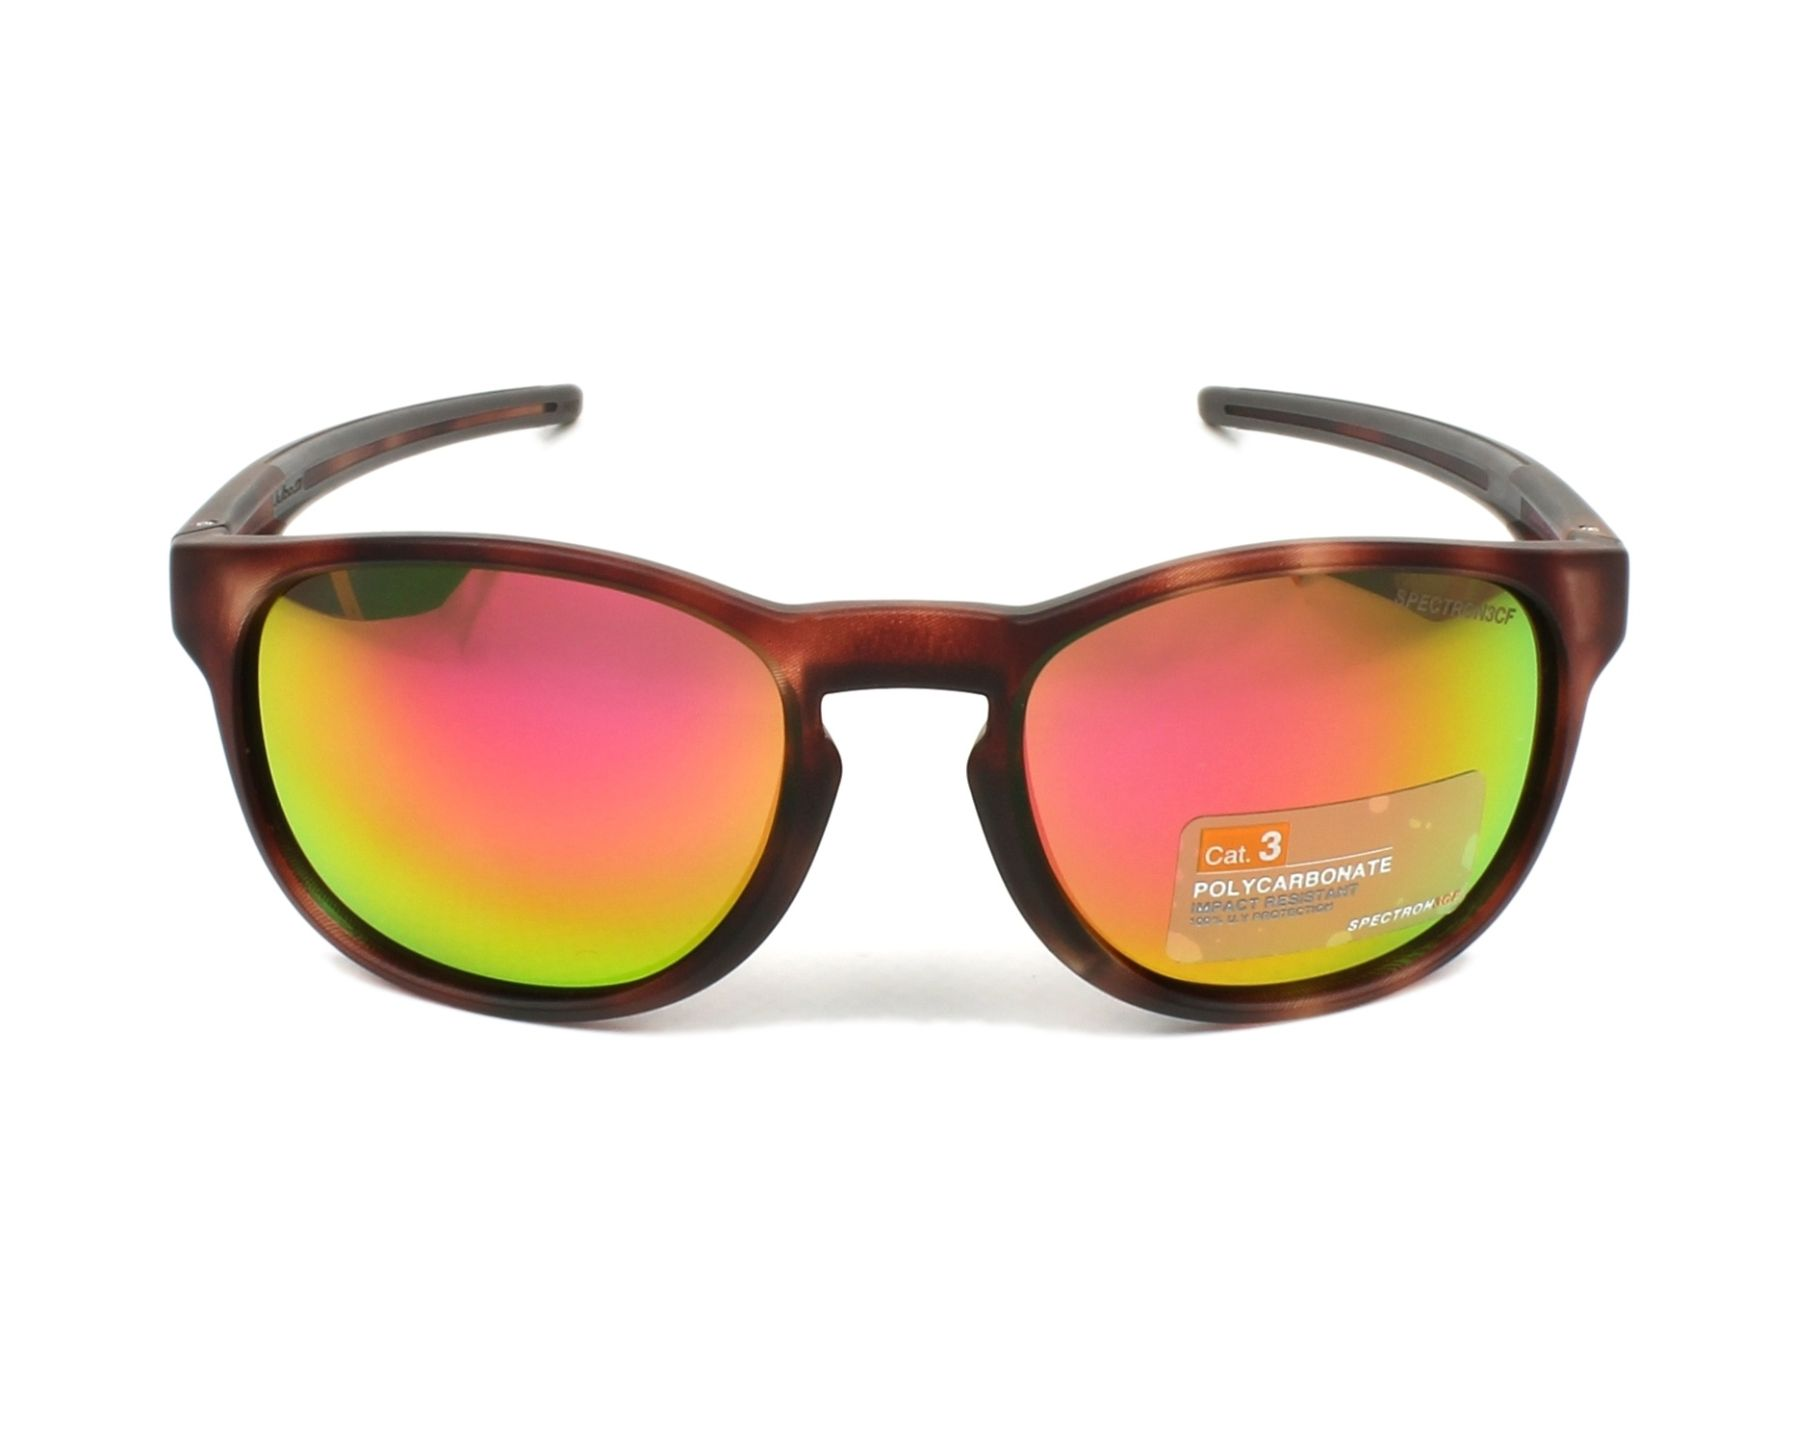 d386d655d7 Sunglasses Julbo J503 1151 51-17 Havana front view